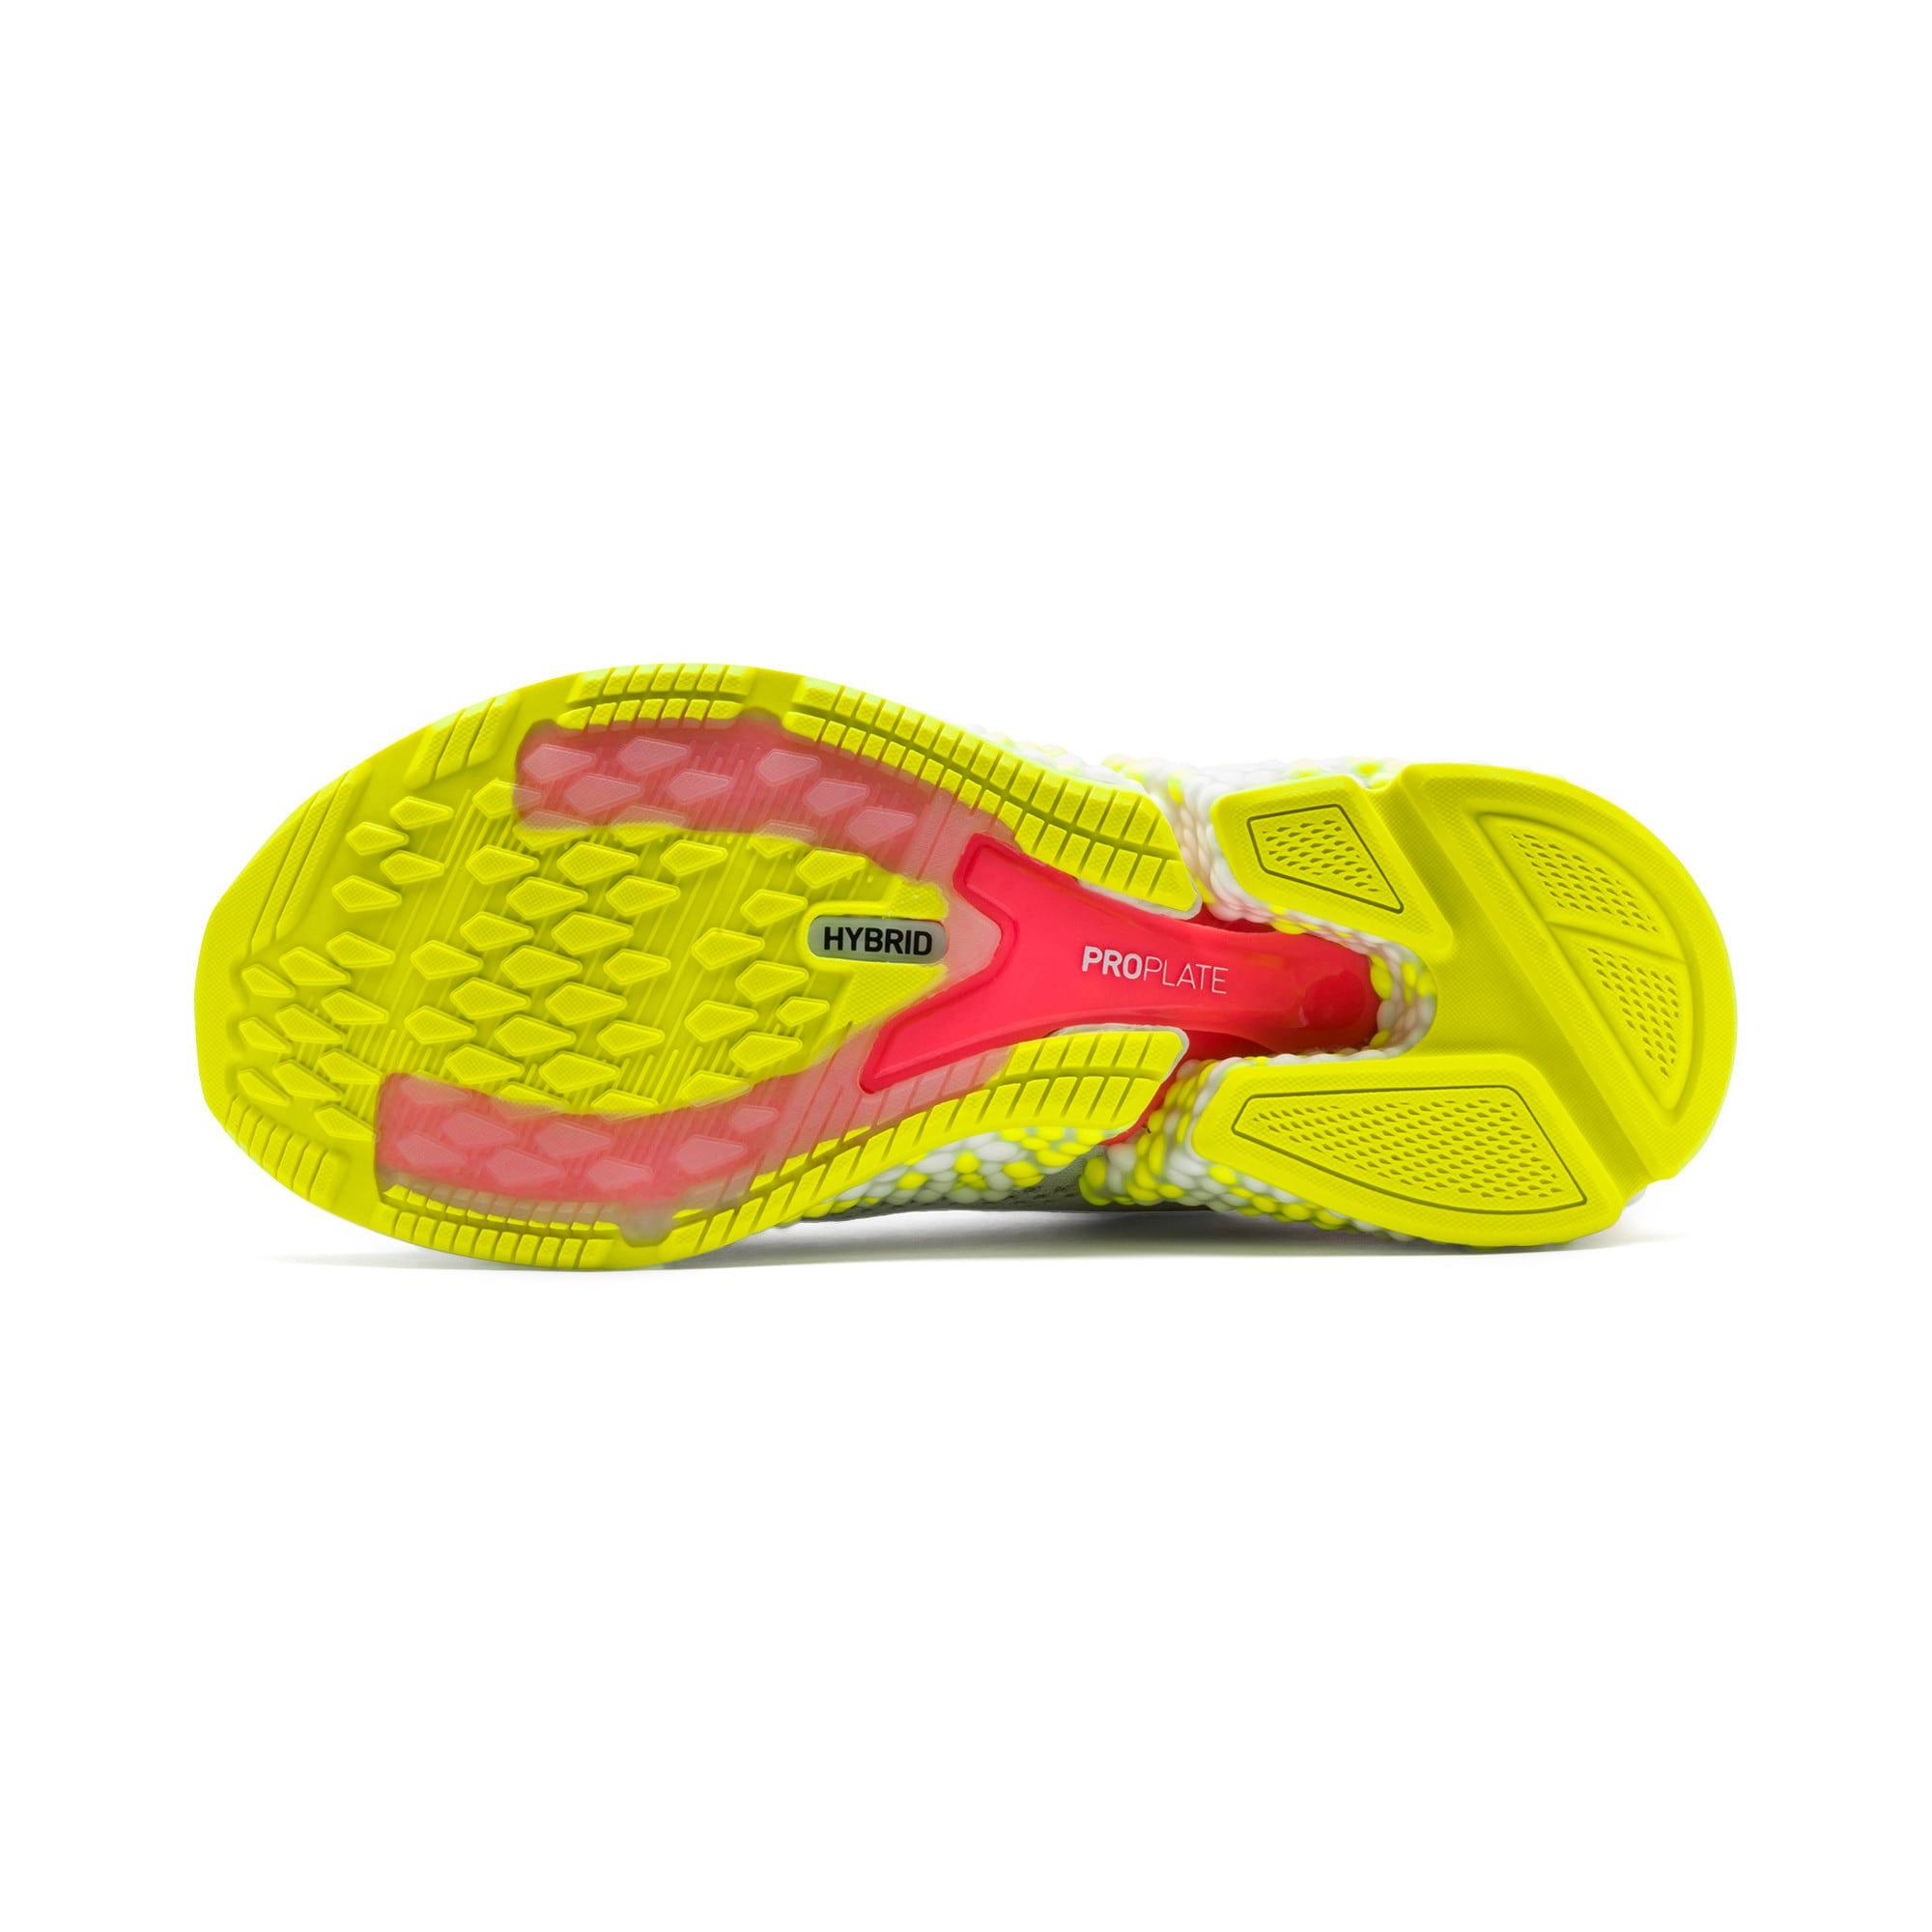 Thumbnail 5 van HYBRID SPEED Orbiter hardloopschoenen voor vrouwen, Puma White-Yellow Alert, medium